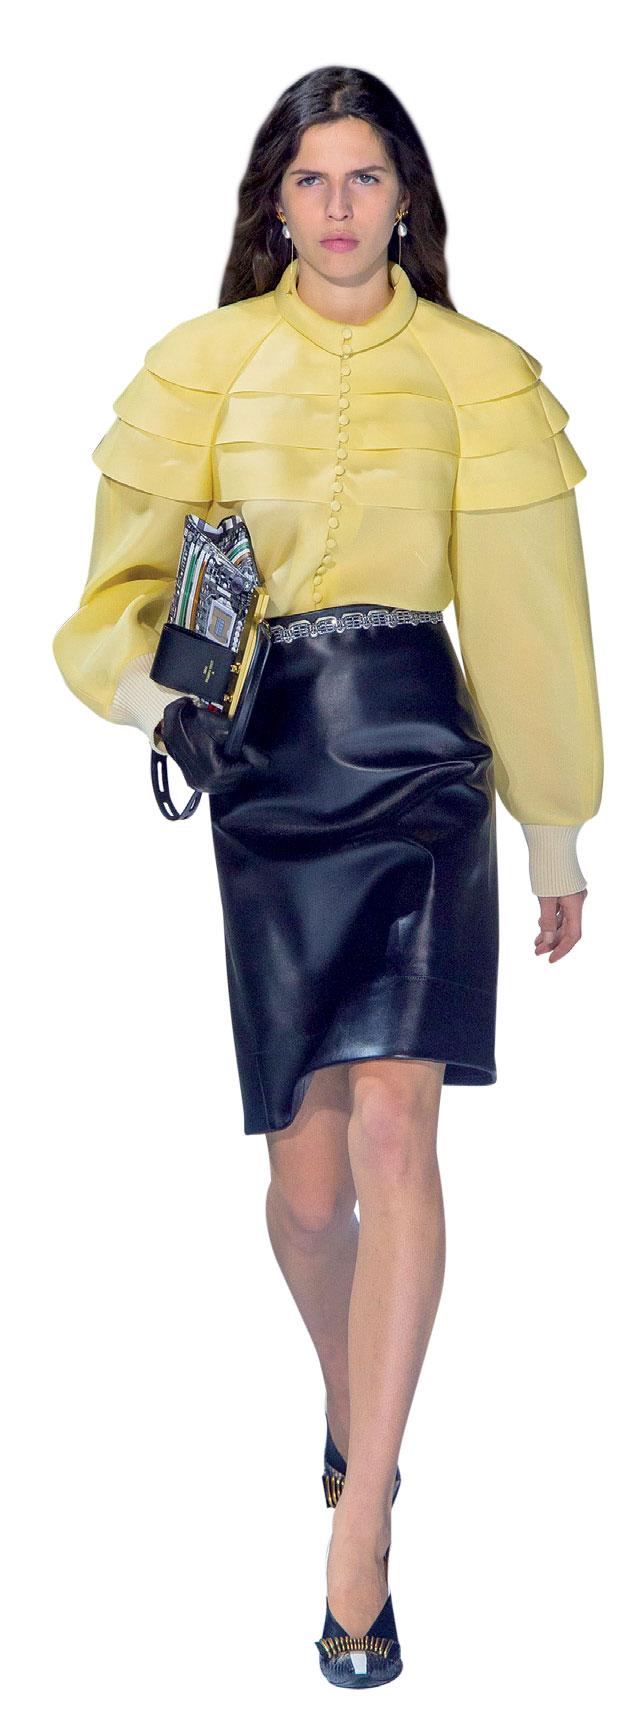 Thời-trang-thập-niên-80-Louis Vuitton